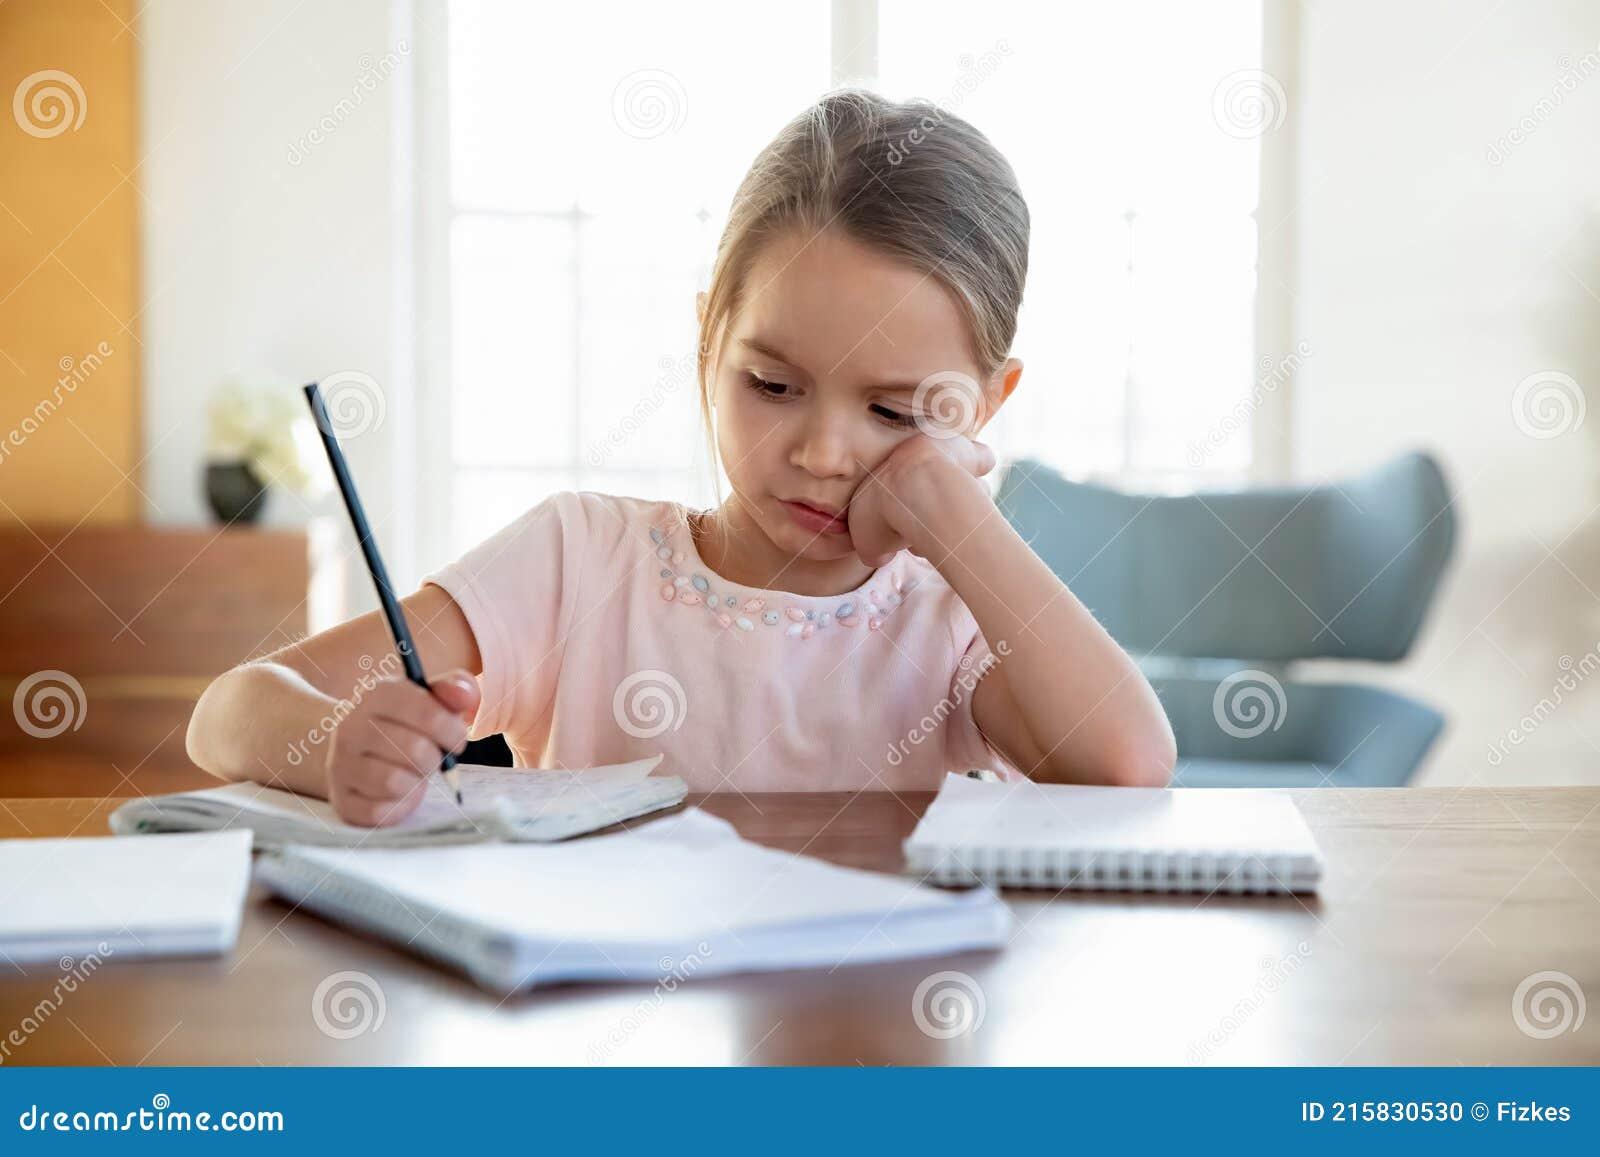 Teenage Girl Doing Homework High-Res Stock Photo - Getty